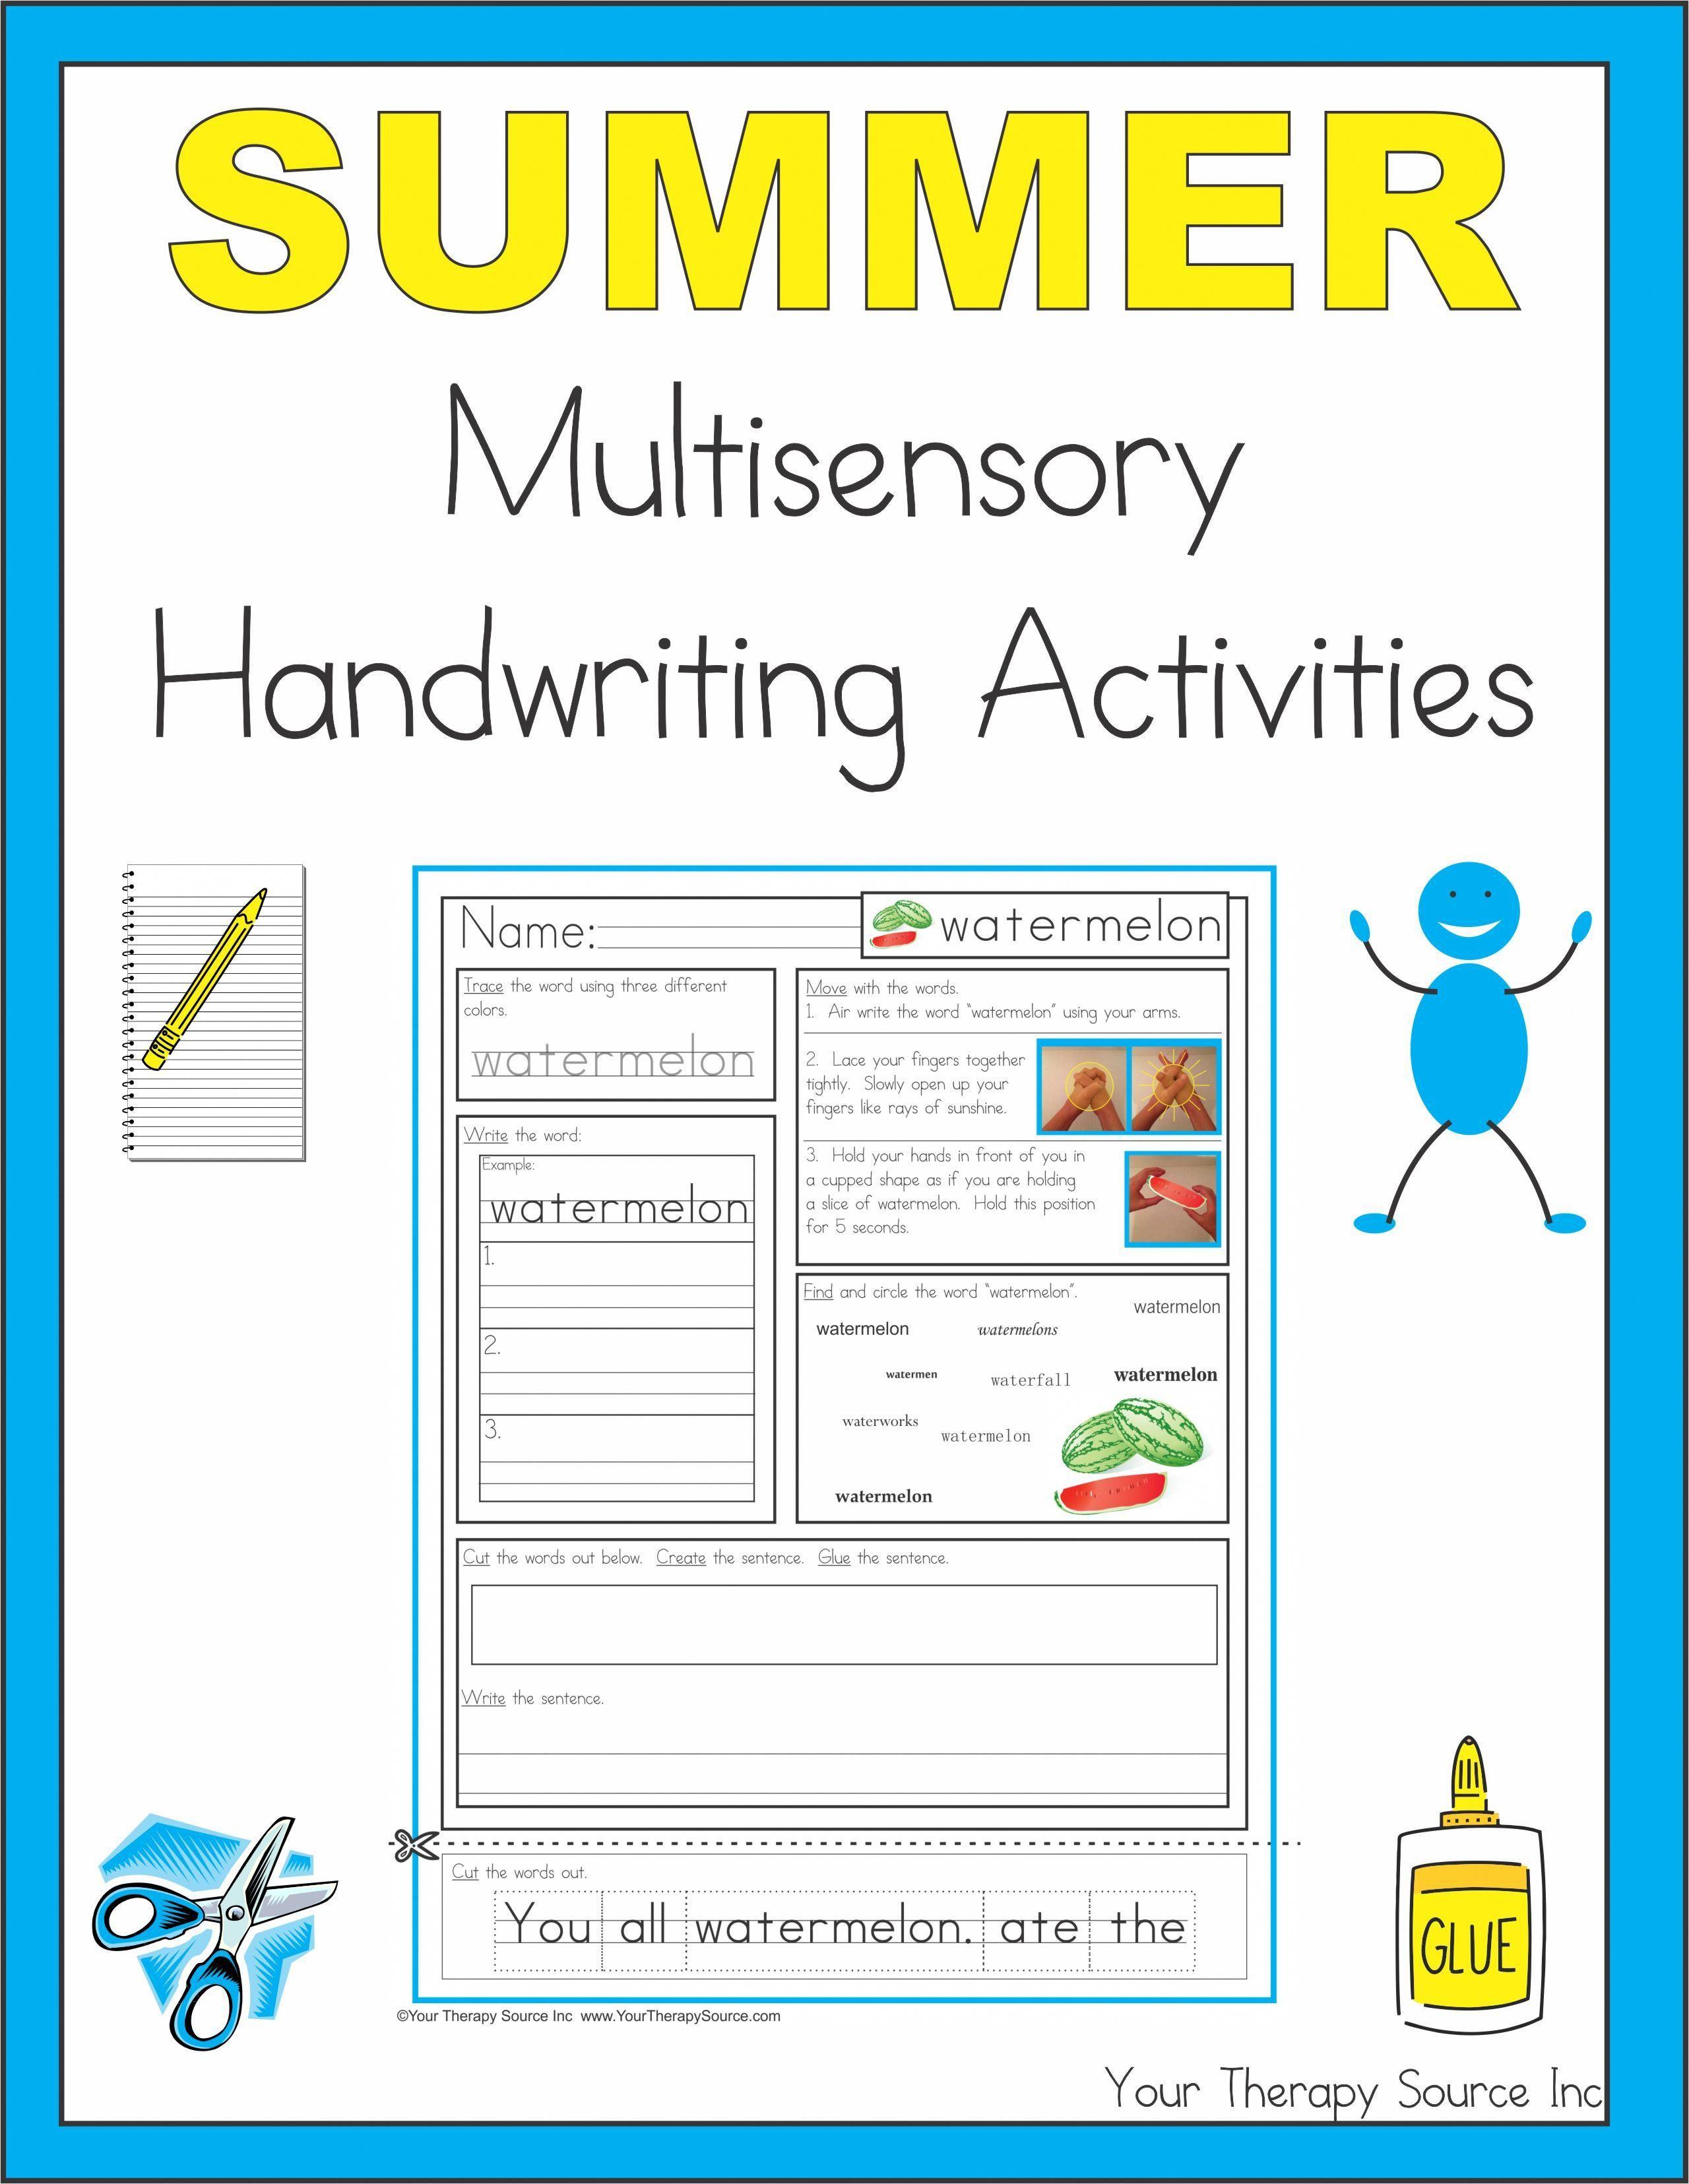 Summer Multi Sensory Handwriting Activities Printables